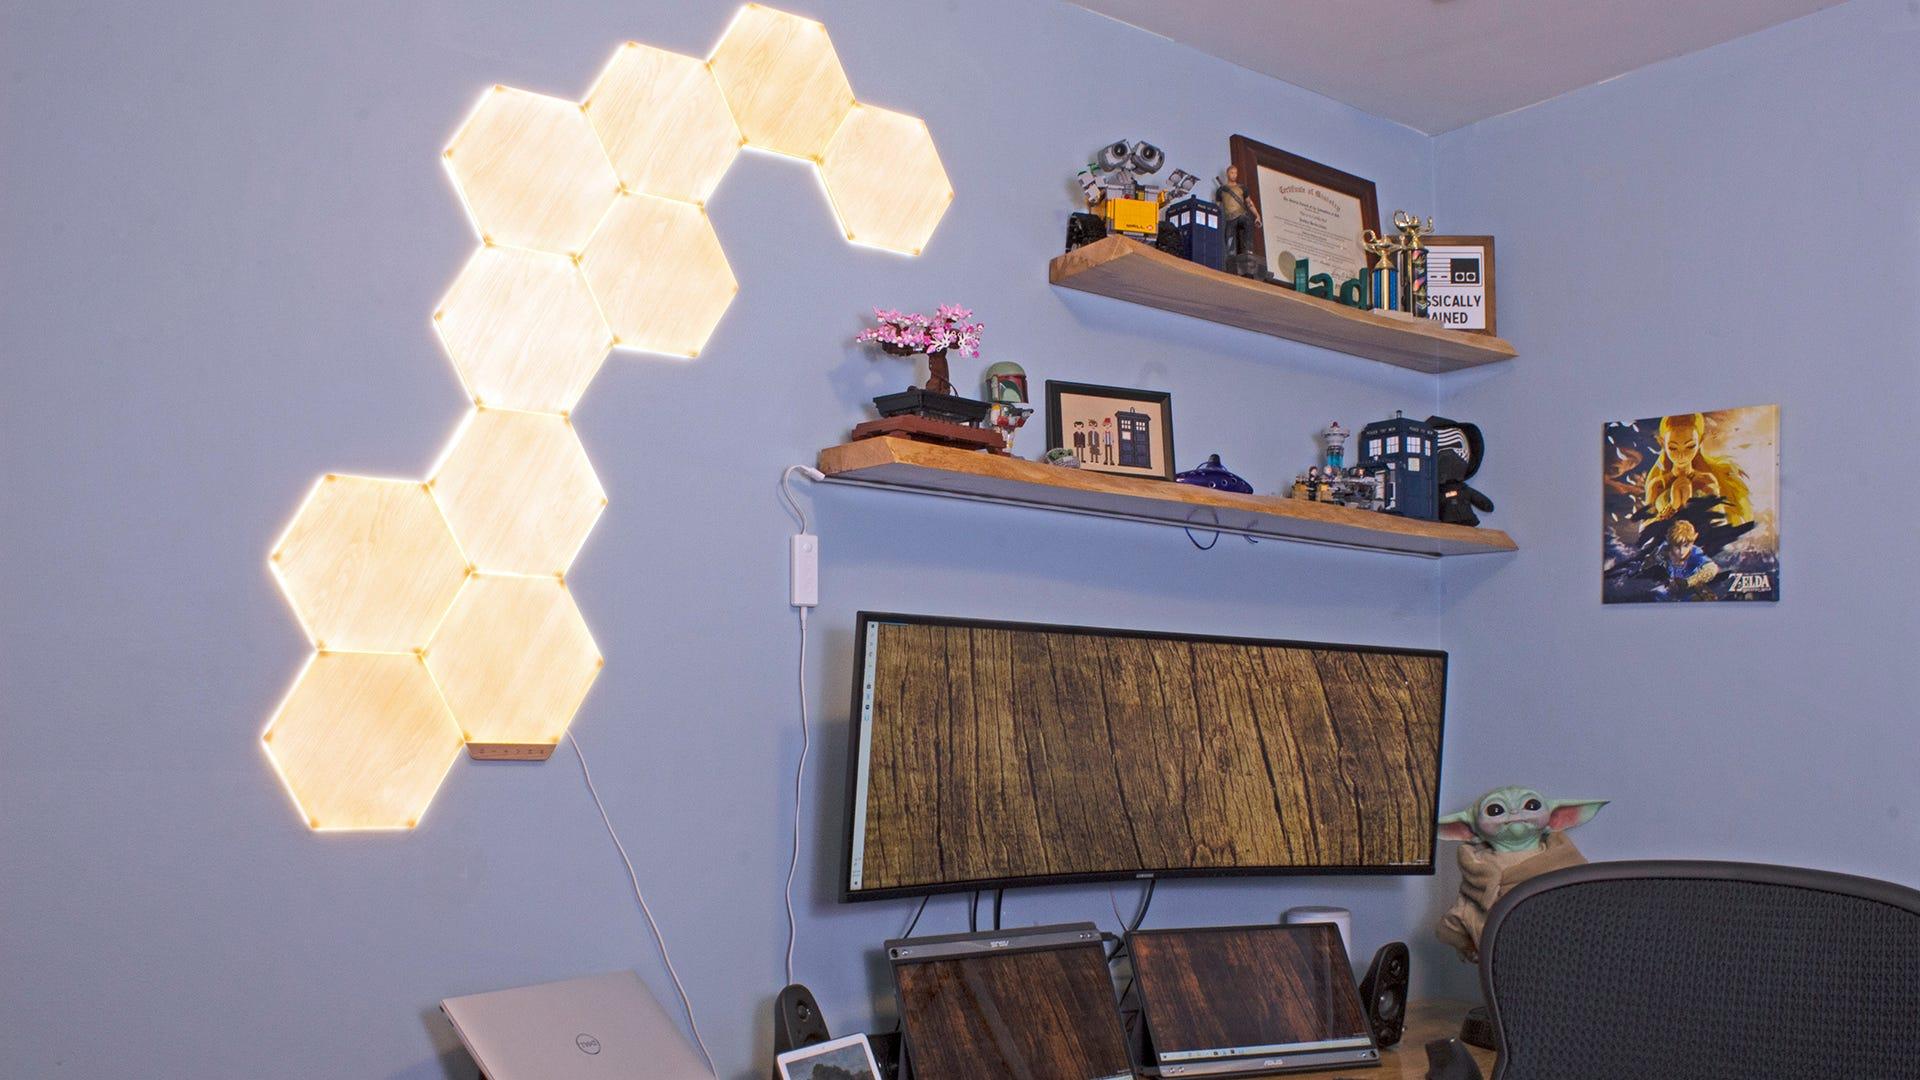 A set of wood-grain hexagons lit in yellow light.